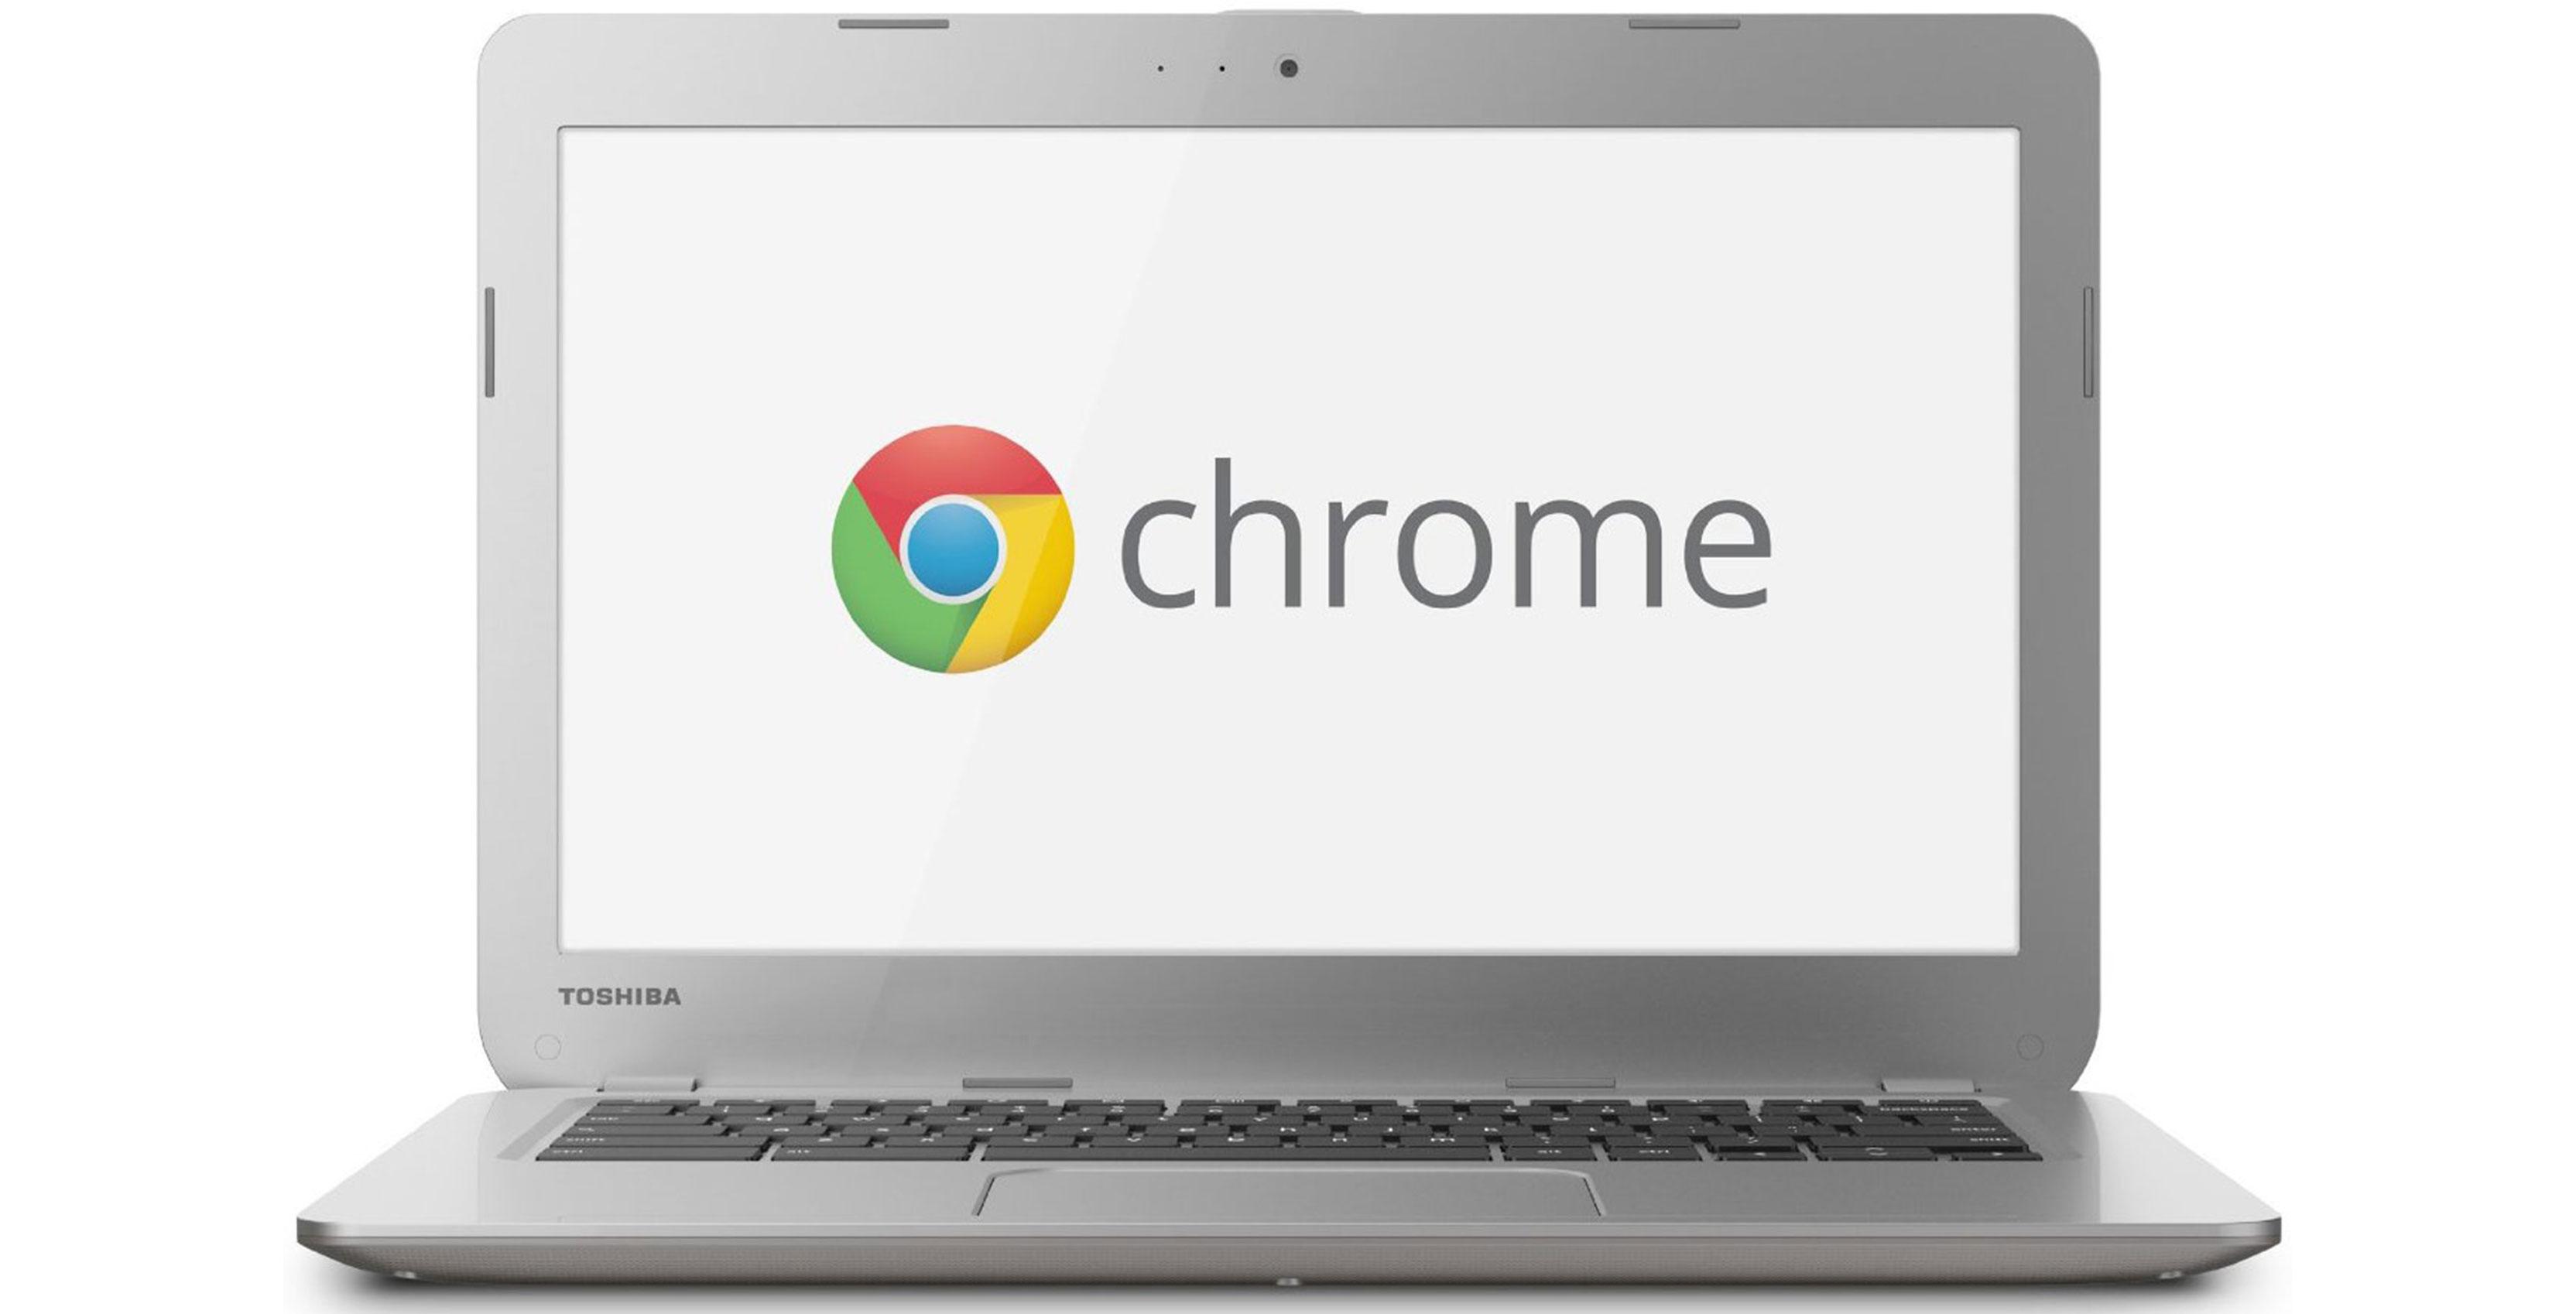 Google Chromebook design